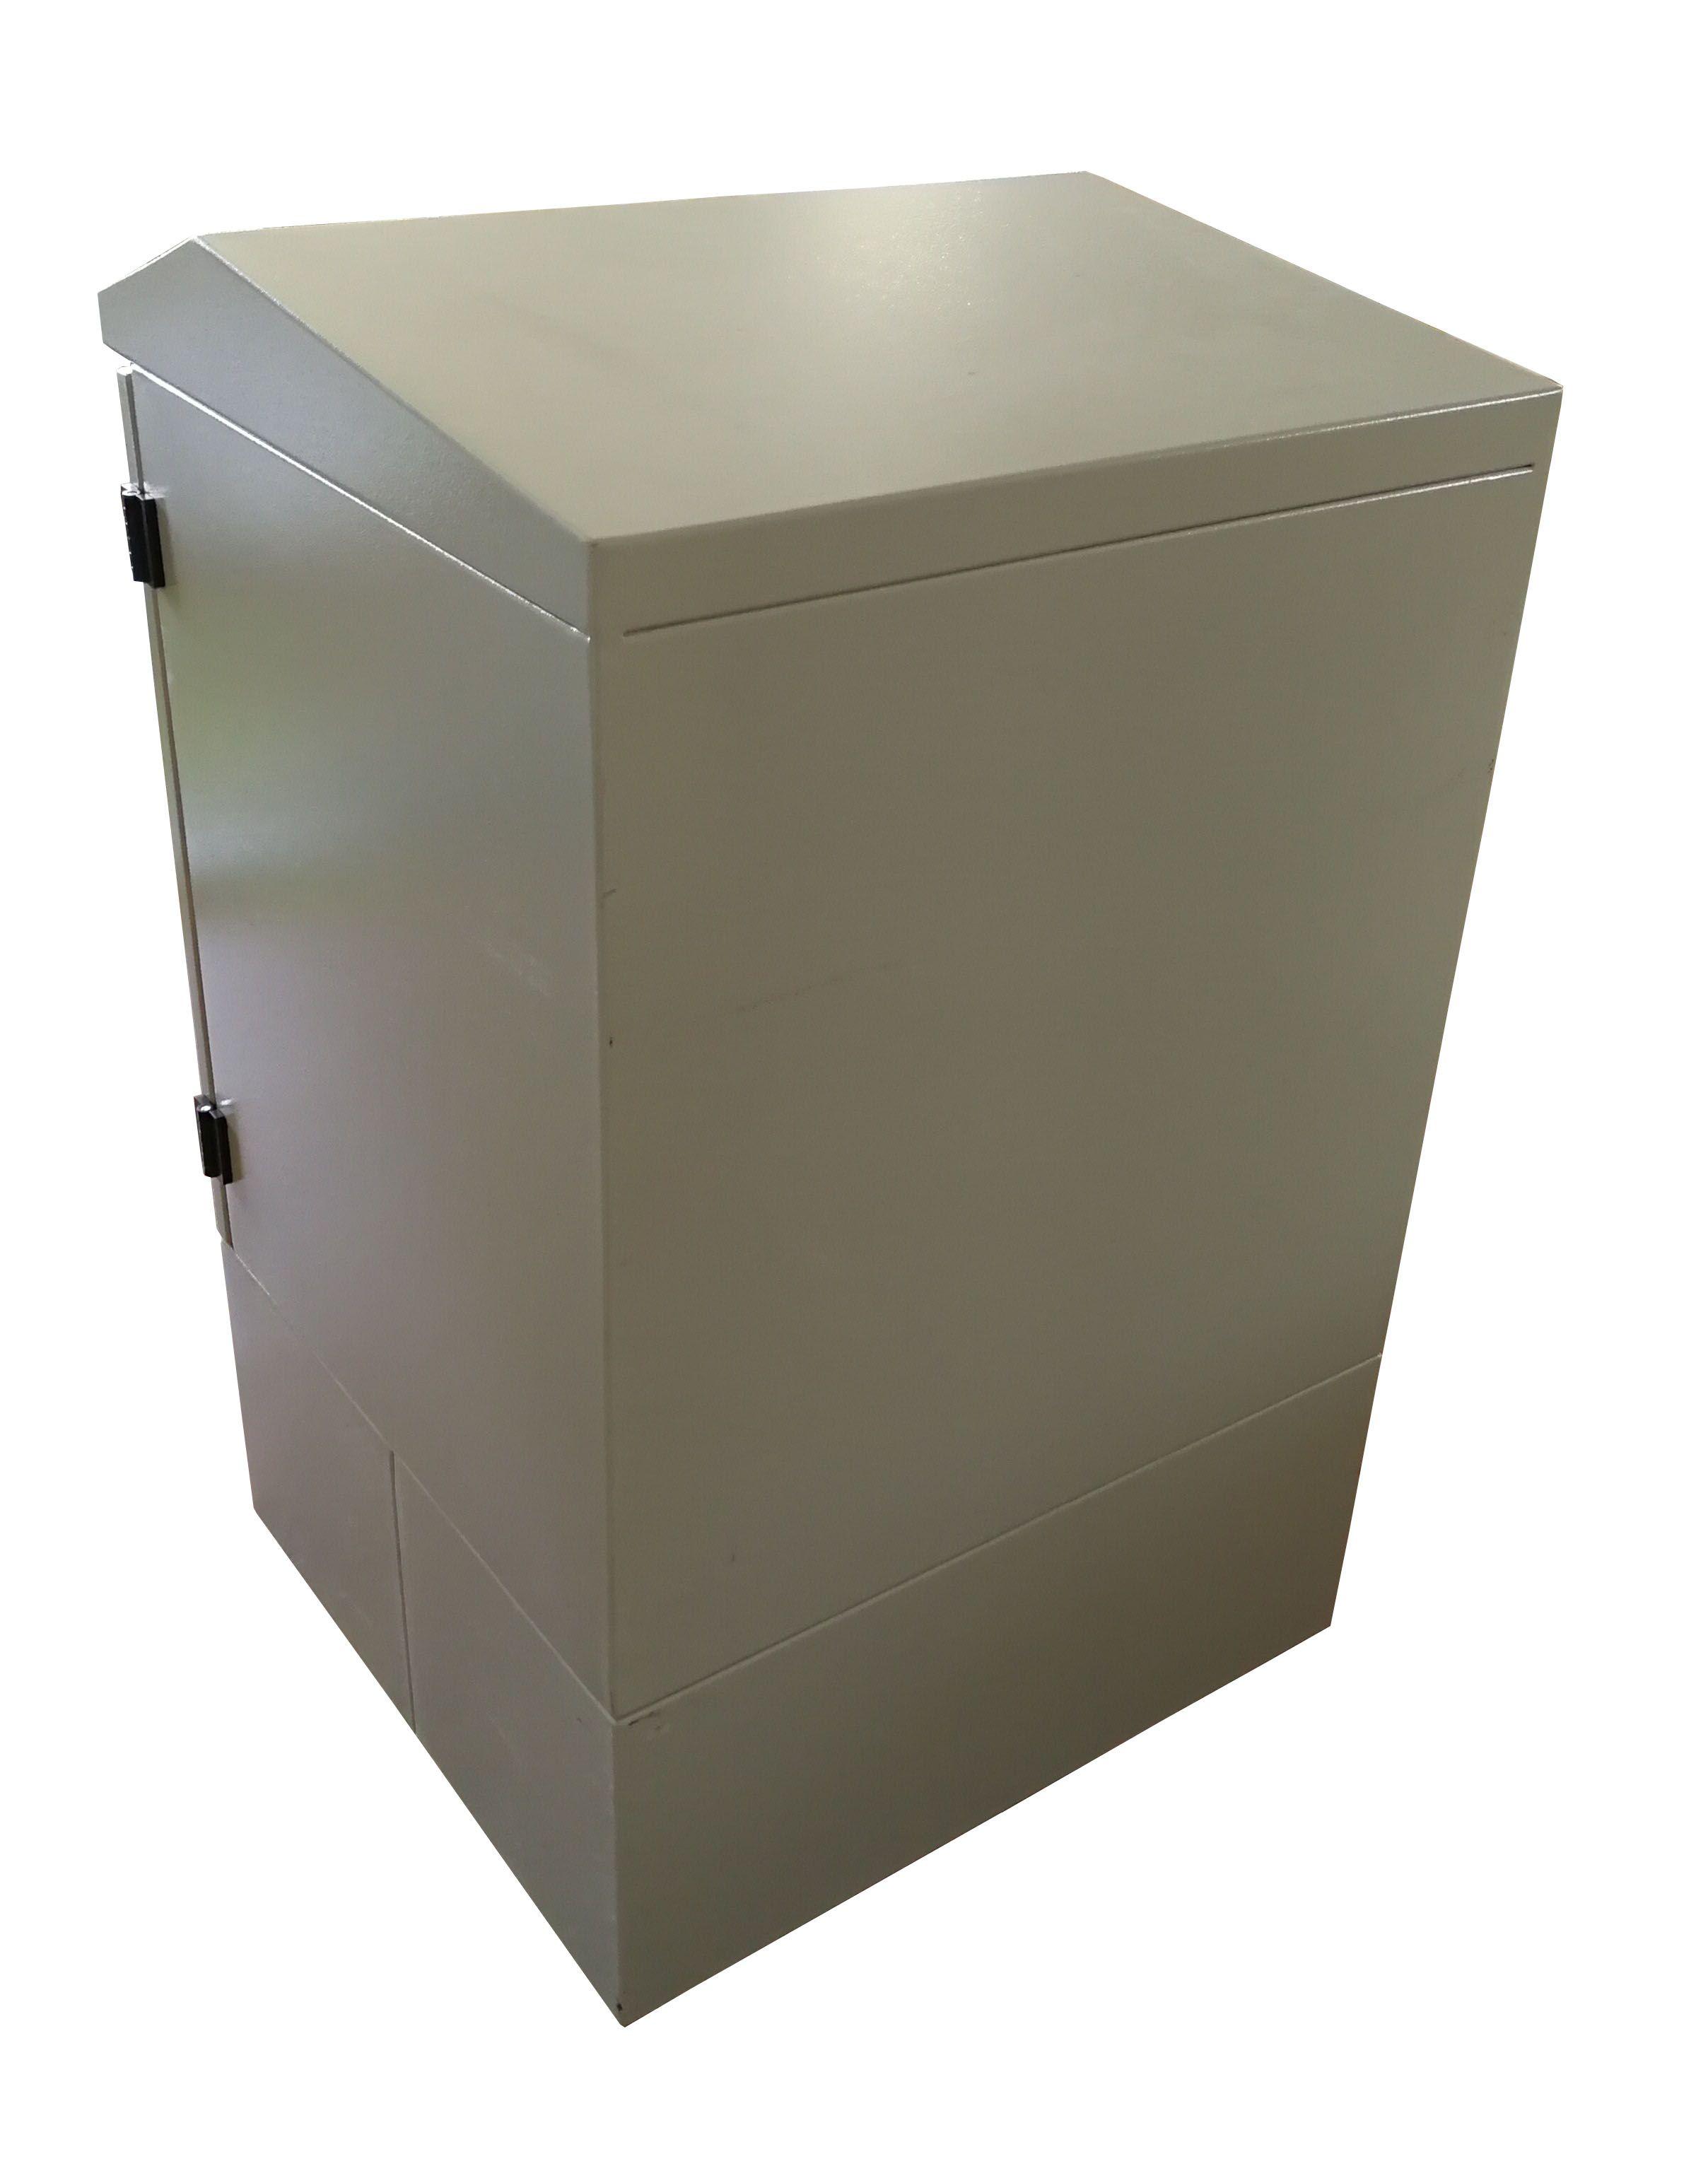 Telecom Equipment Racks Cabinets Outdoor Enclosures Rack